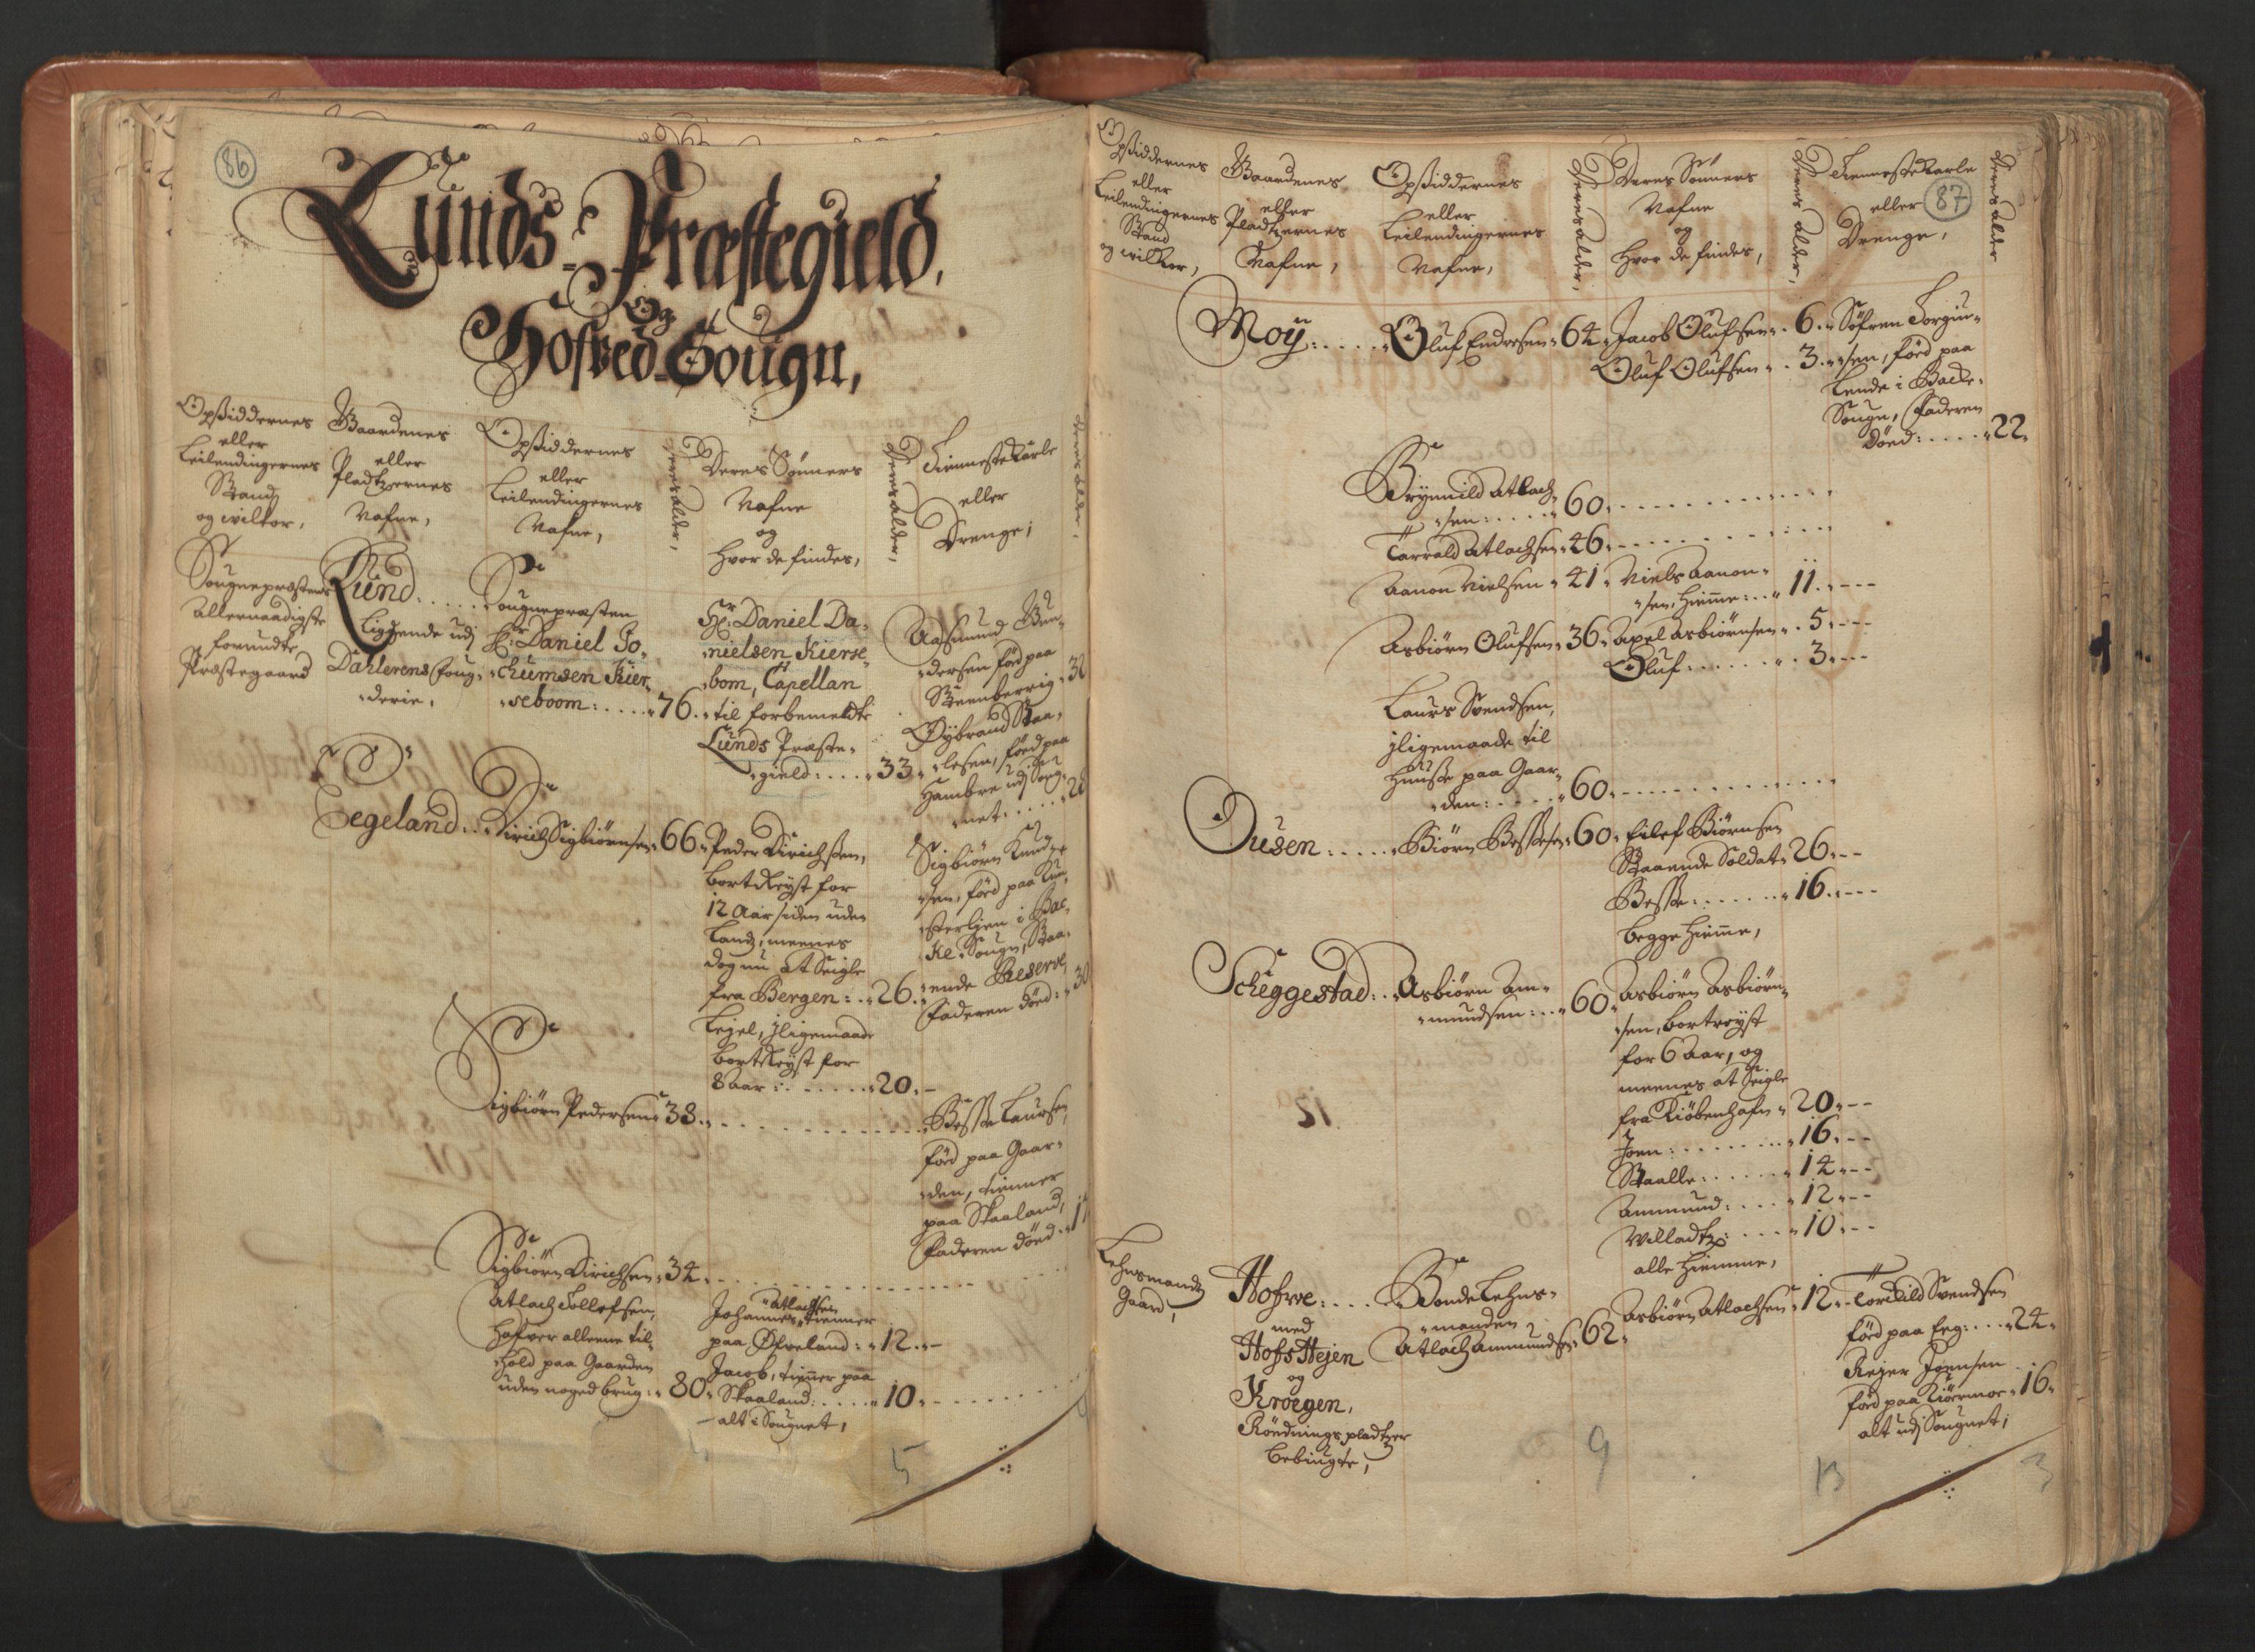 RA, Manntallet 1701, nr. 4: Jæren og Dalane fogderi, 1701, s. 86-87